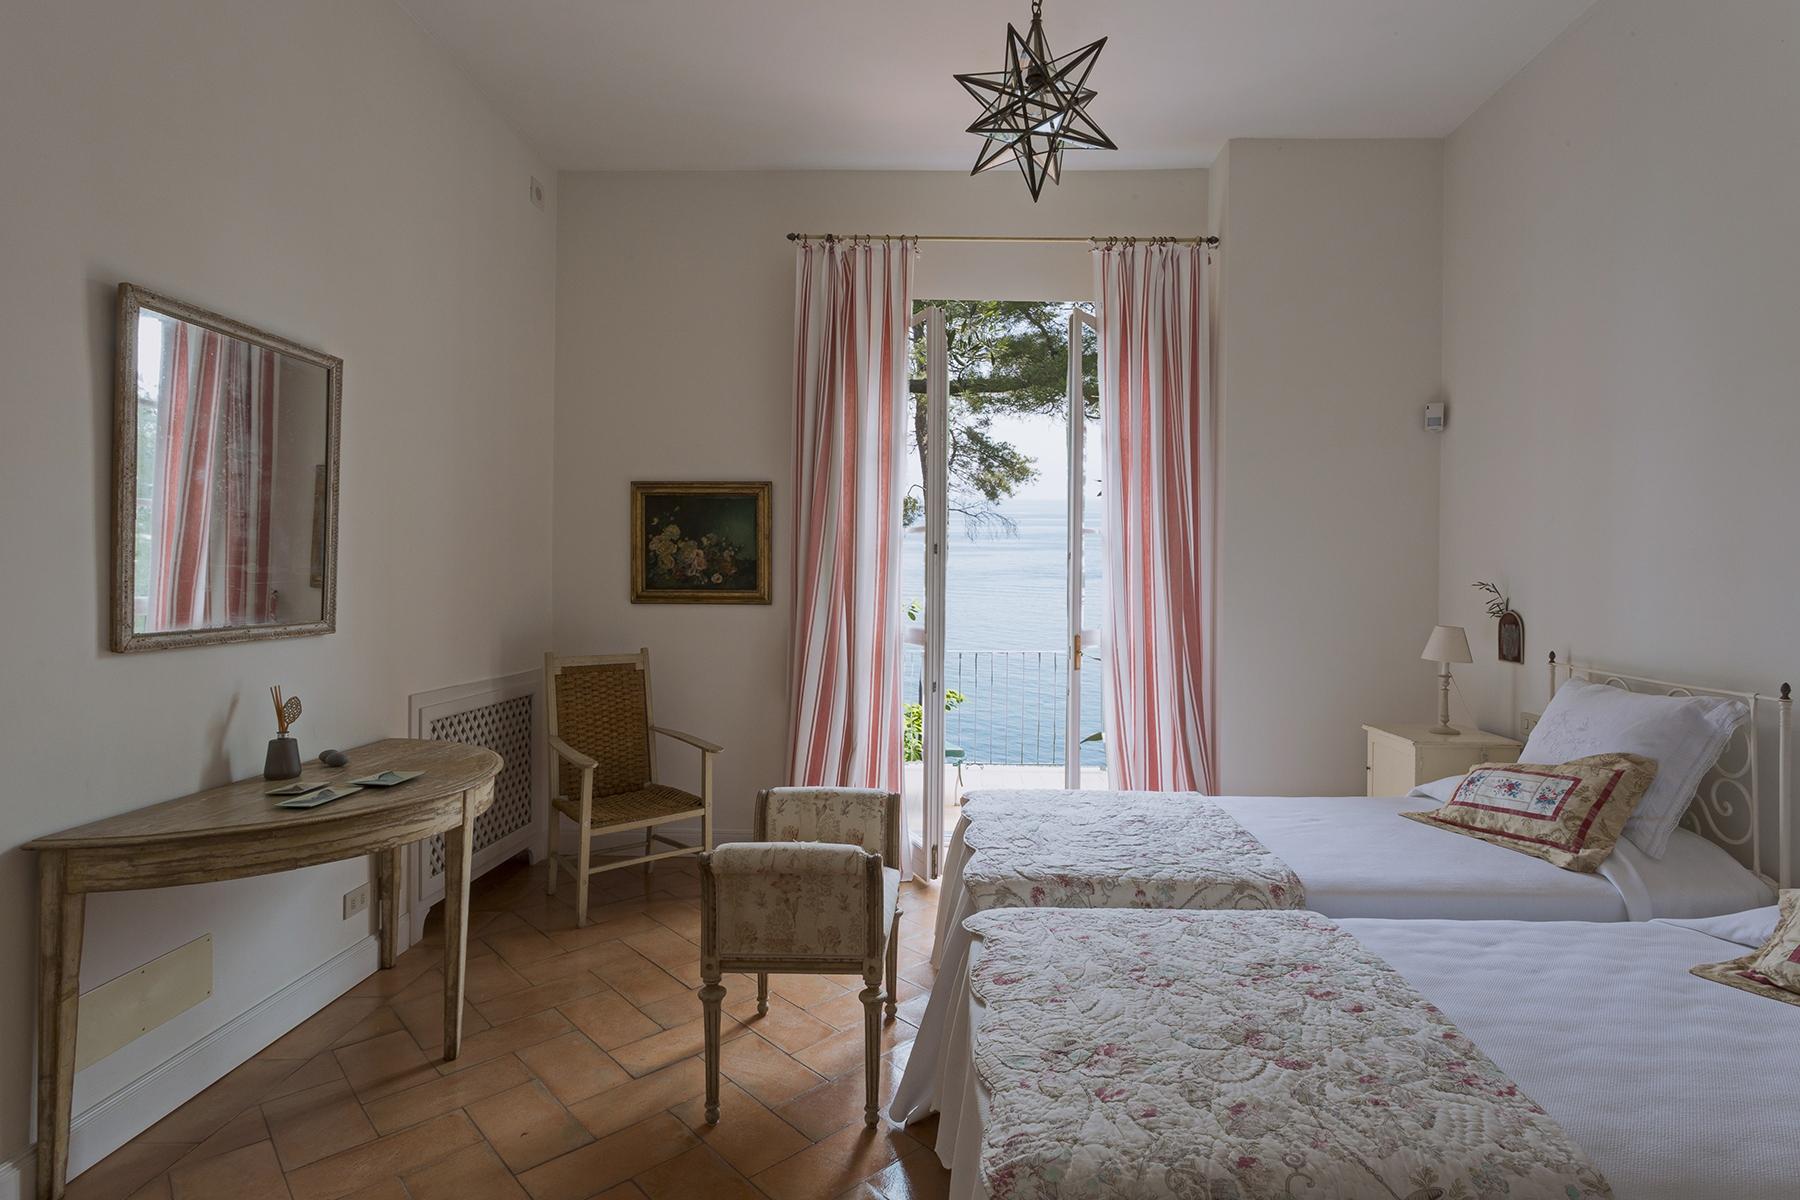 Villa in Vendita a Santa Margherita Ligure: 5 locali, 580 mq - Foto 23